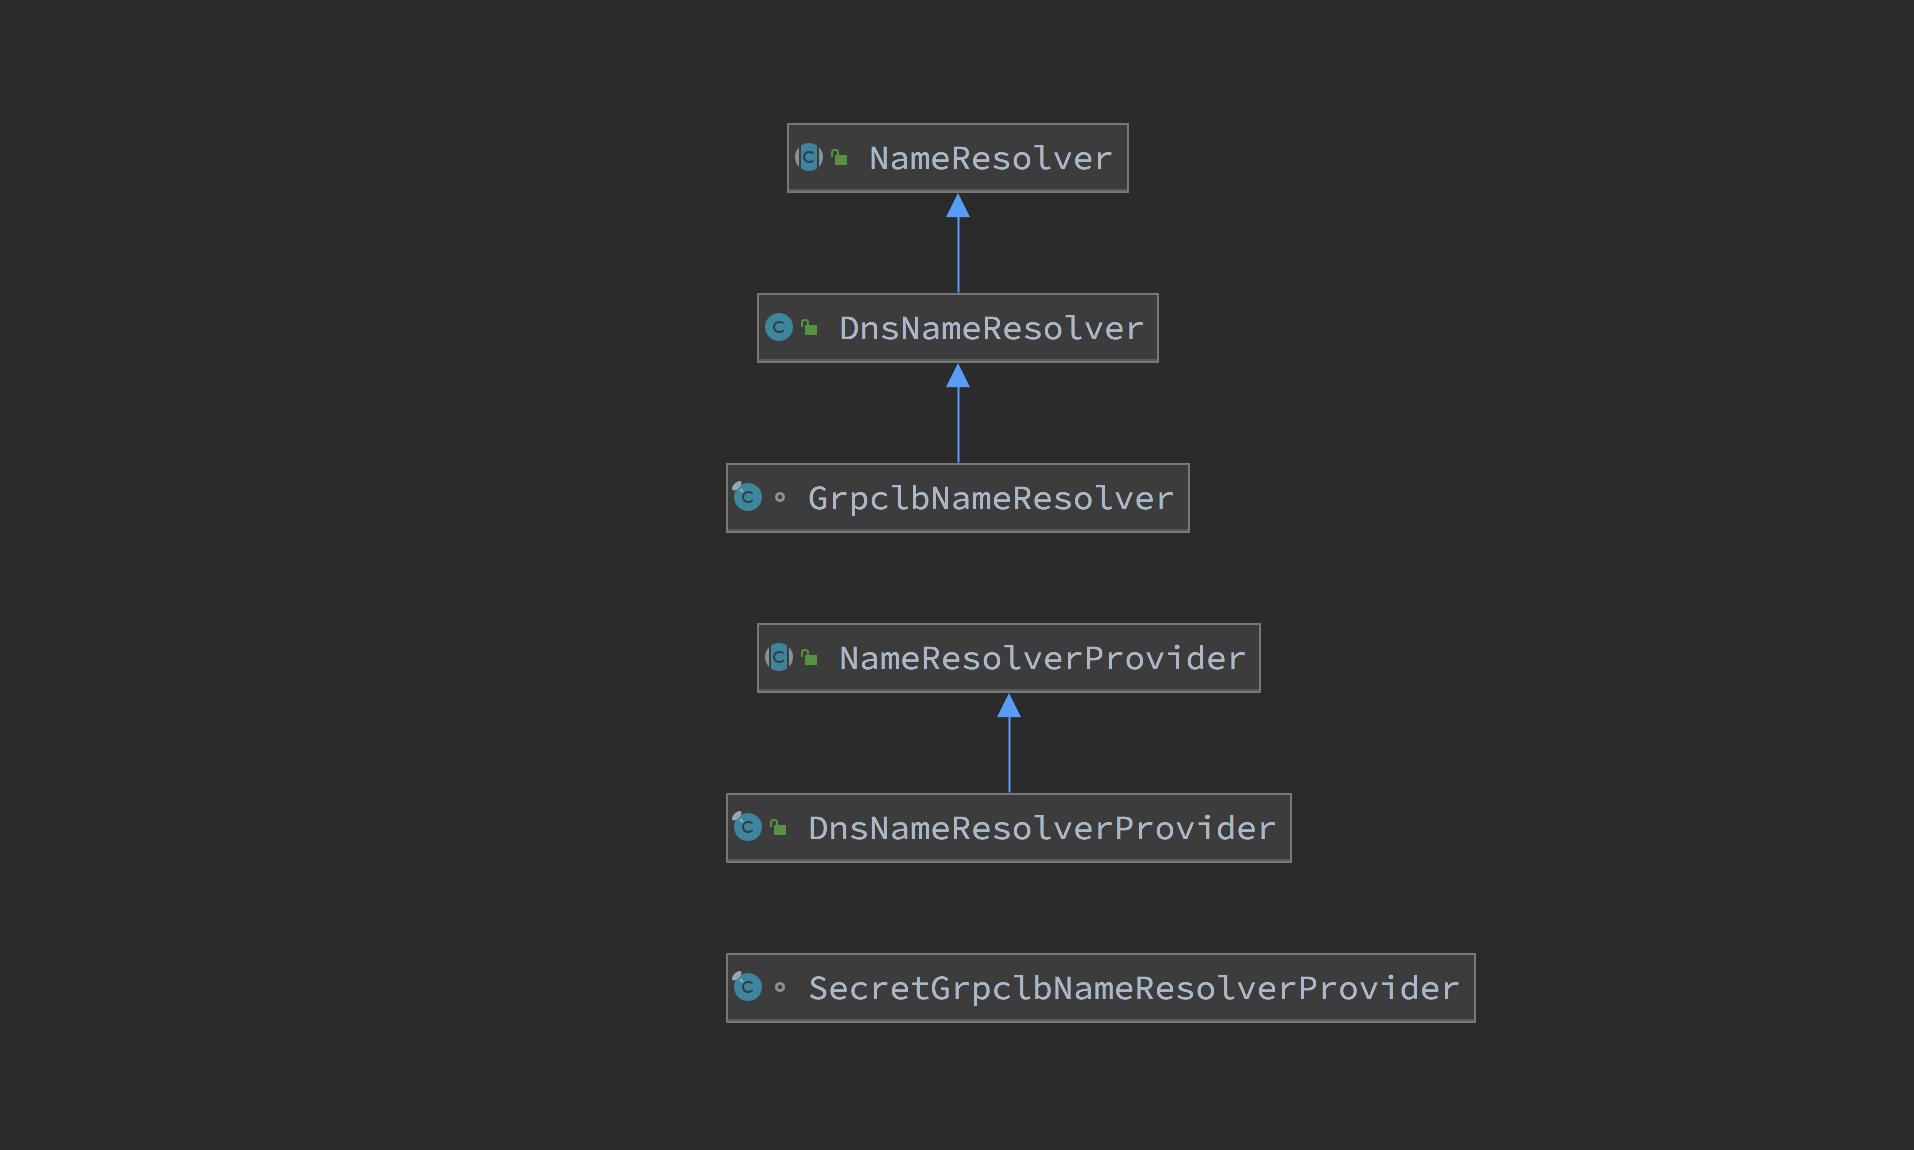 grpc-source-code-name-resolver-diagram.png